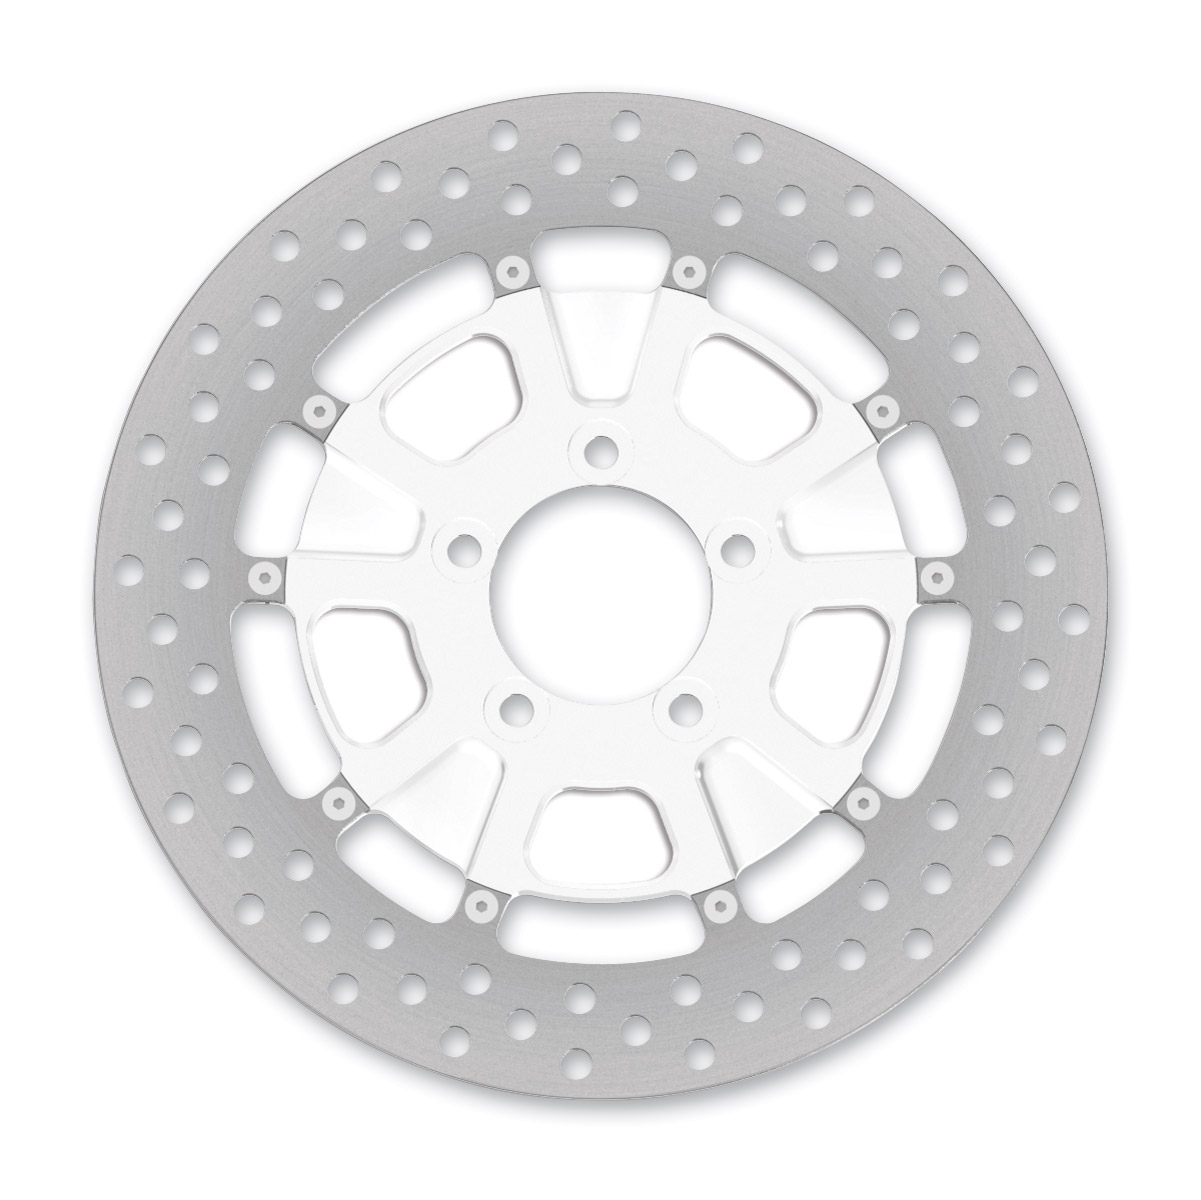 Roland Sands Design Raid Chrome Two-Piece Front Brake Rotor, 11.5